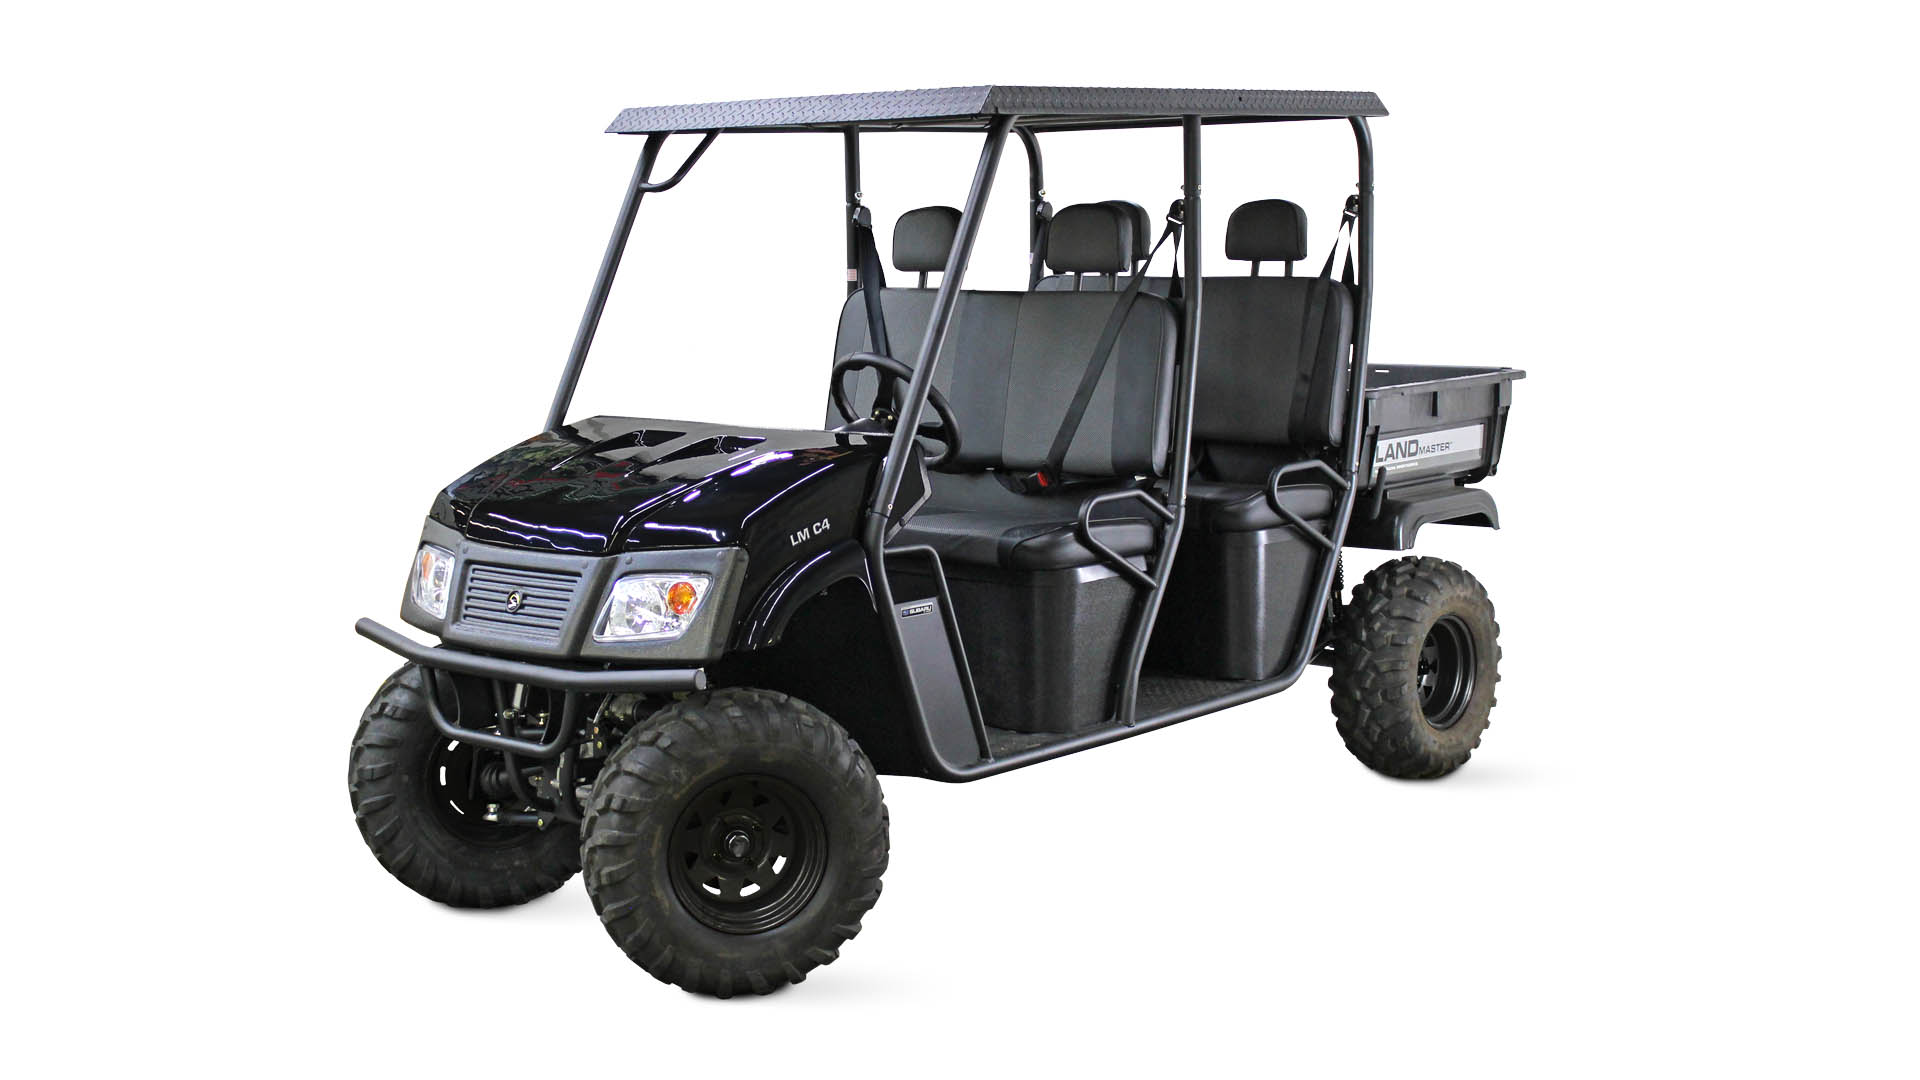 American Sportworks Landmaster UTV – LMC4 Crew Cab